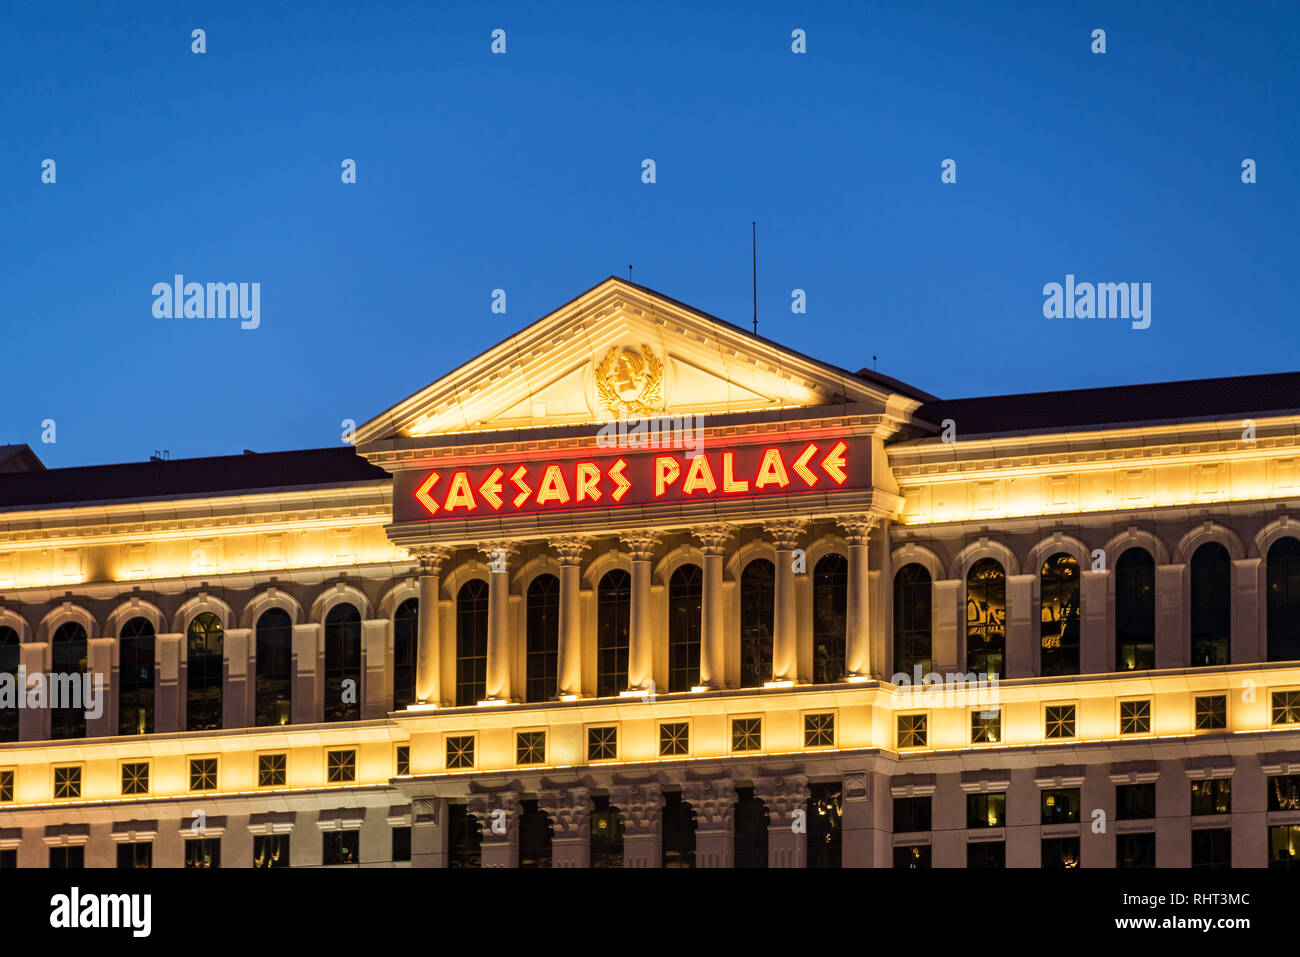 LAS VEGAS, SEPTEMBER 17: View of the exterior of Caesars Palace in Las Vegas on September 17, 2015 - Stock Image